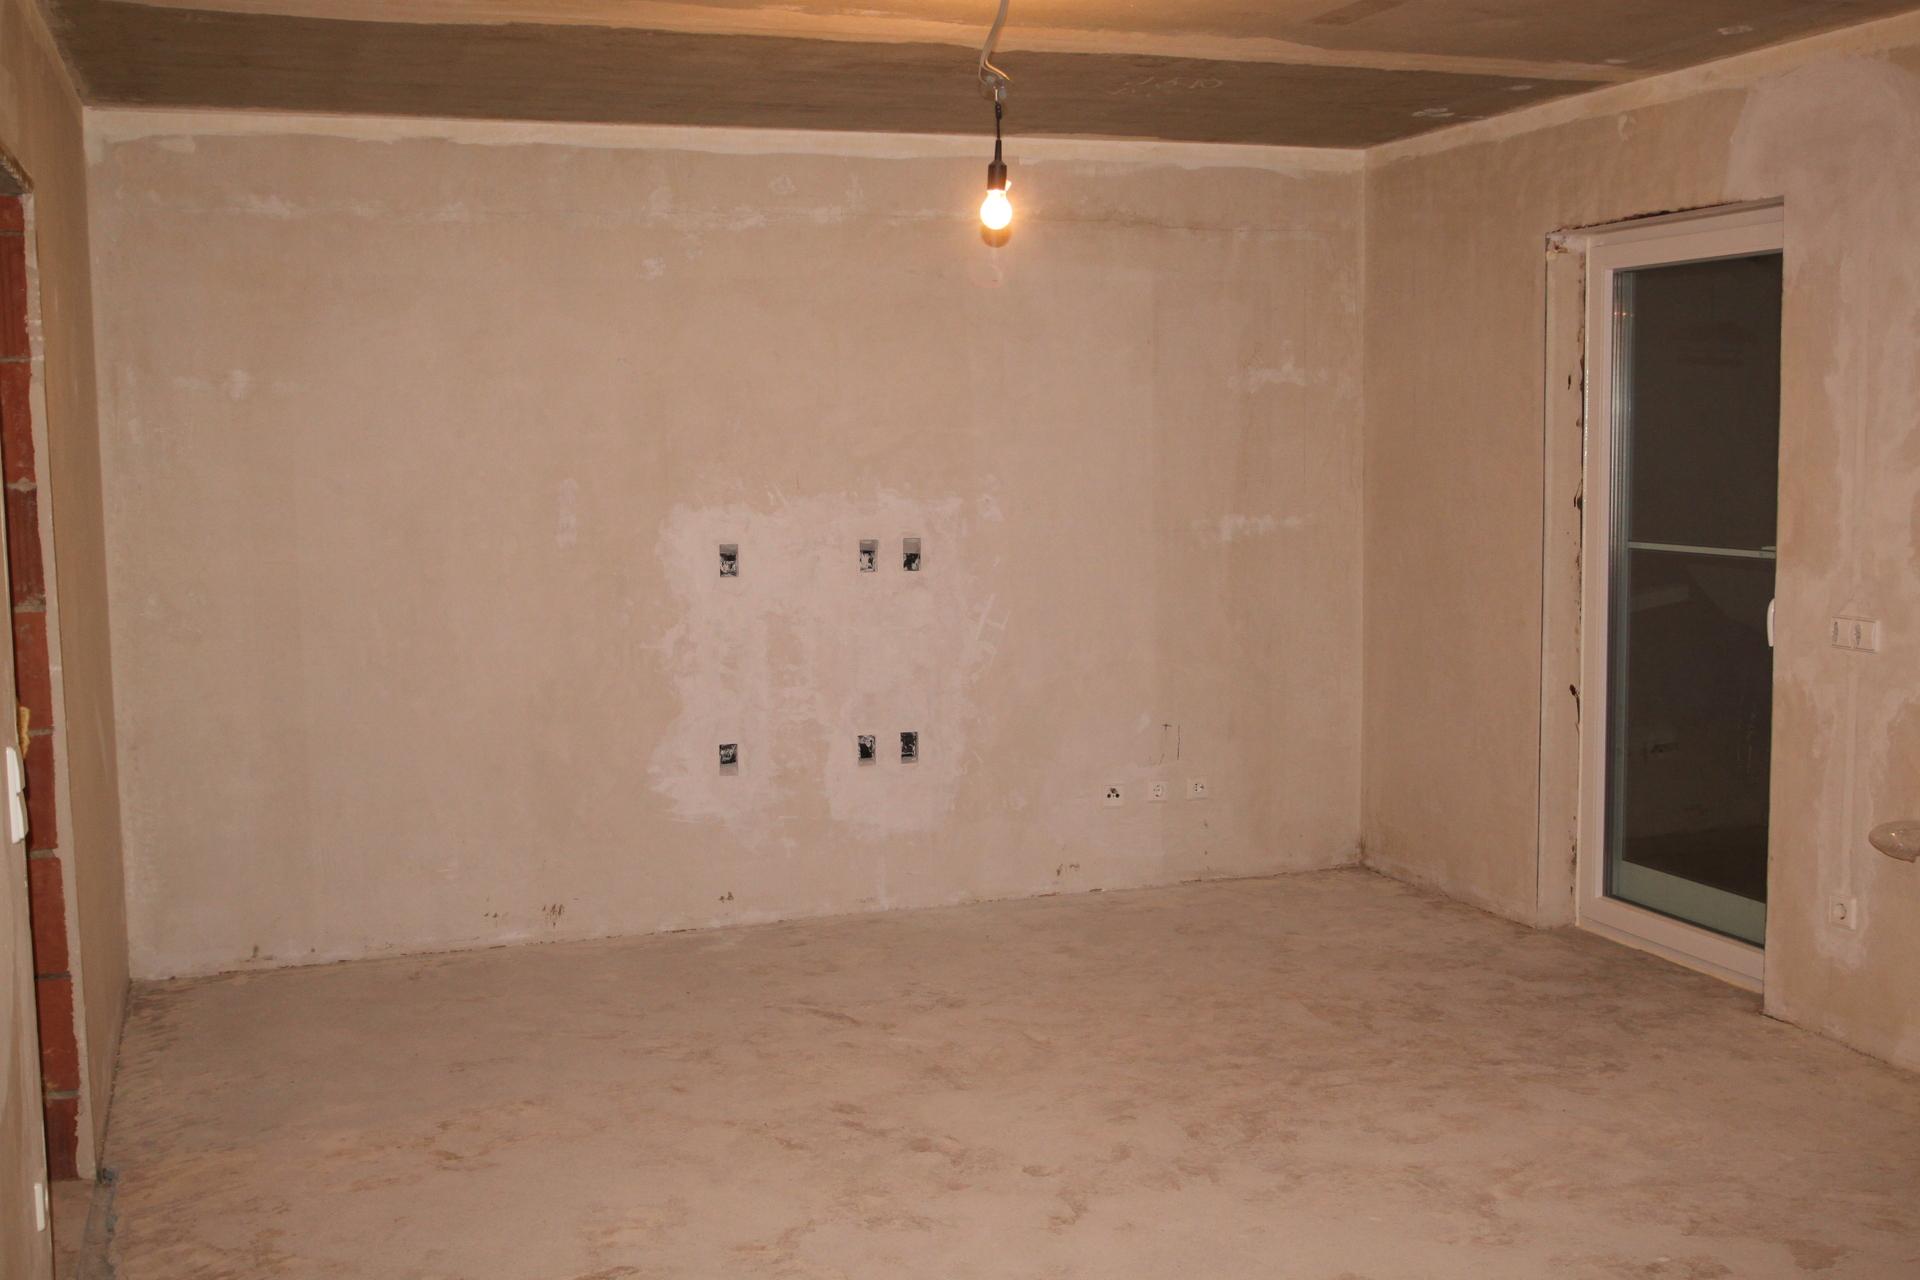 img 6727 doityourself kabelkanal umbau wandmontage hifi bildergalerie. Black Bedroom Furniture Sets. Home Design Ideas